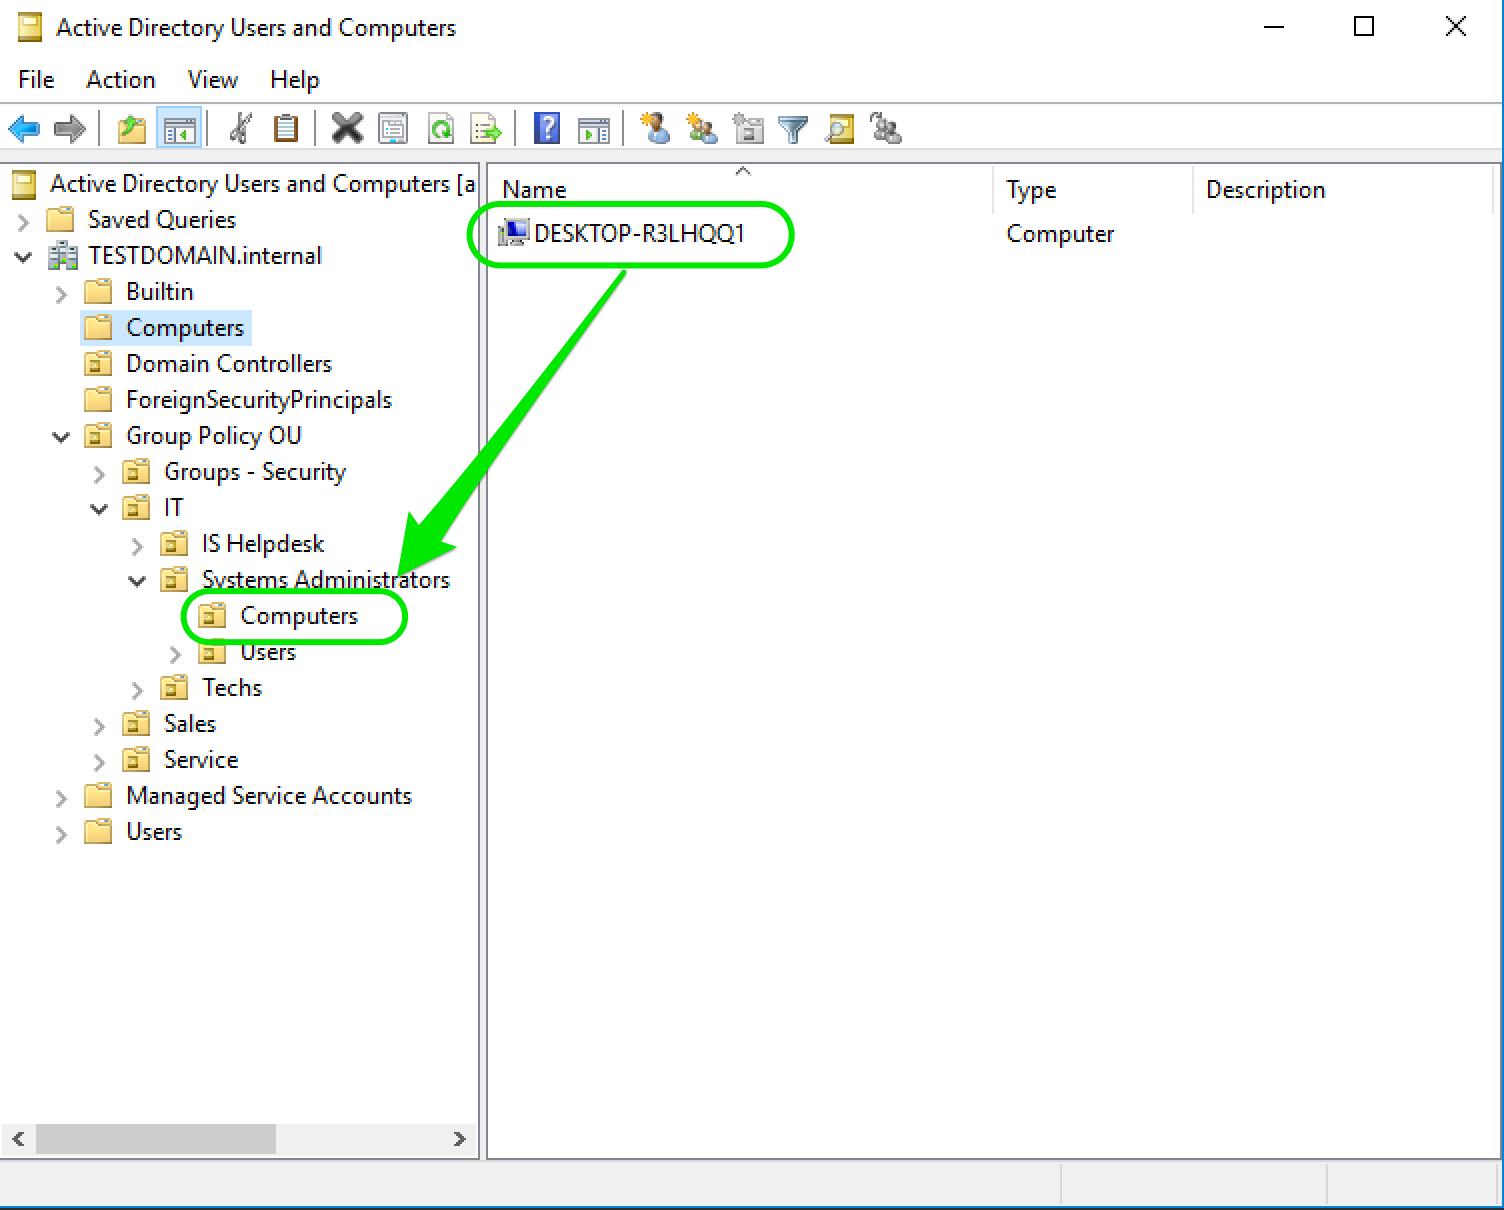 Server-2016-Active-Directory